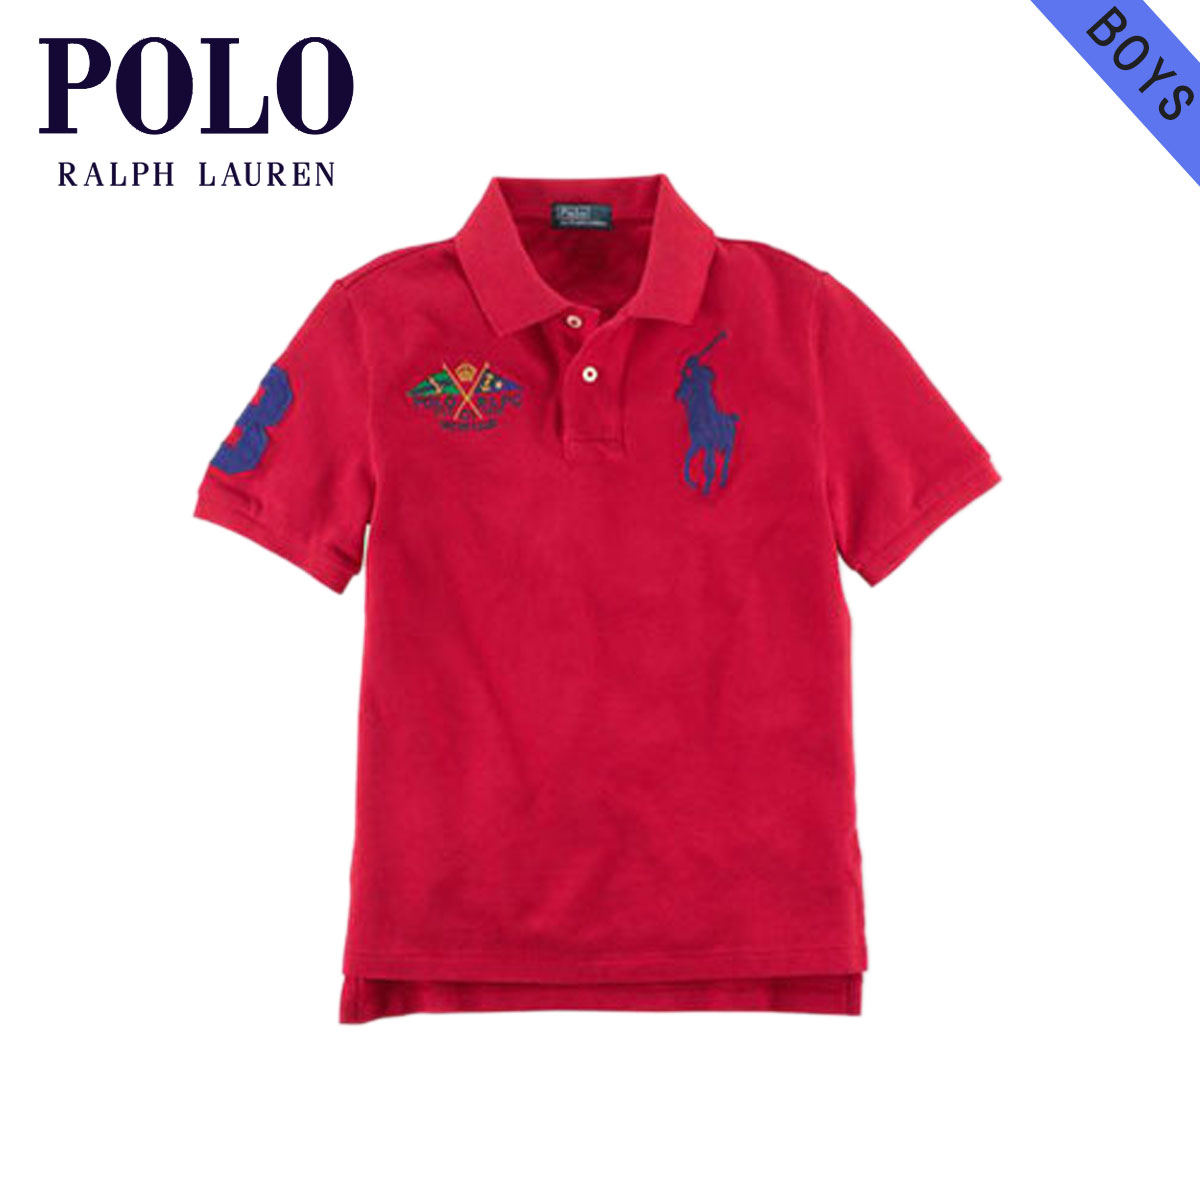 480931bffd653 Poloralflorenkids POLO RALPH LAUREN CHILDREN genuine kids clothing boys Polo  Shirt Big Pony Flag Polo  18121136 RED 10P22Jul14